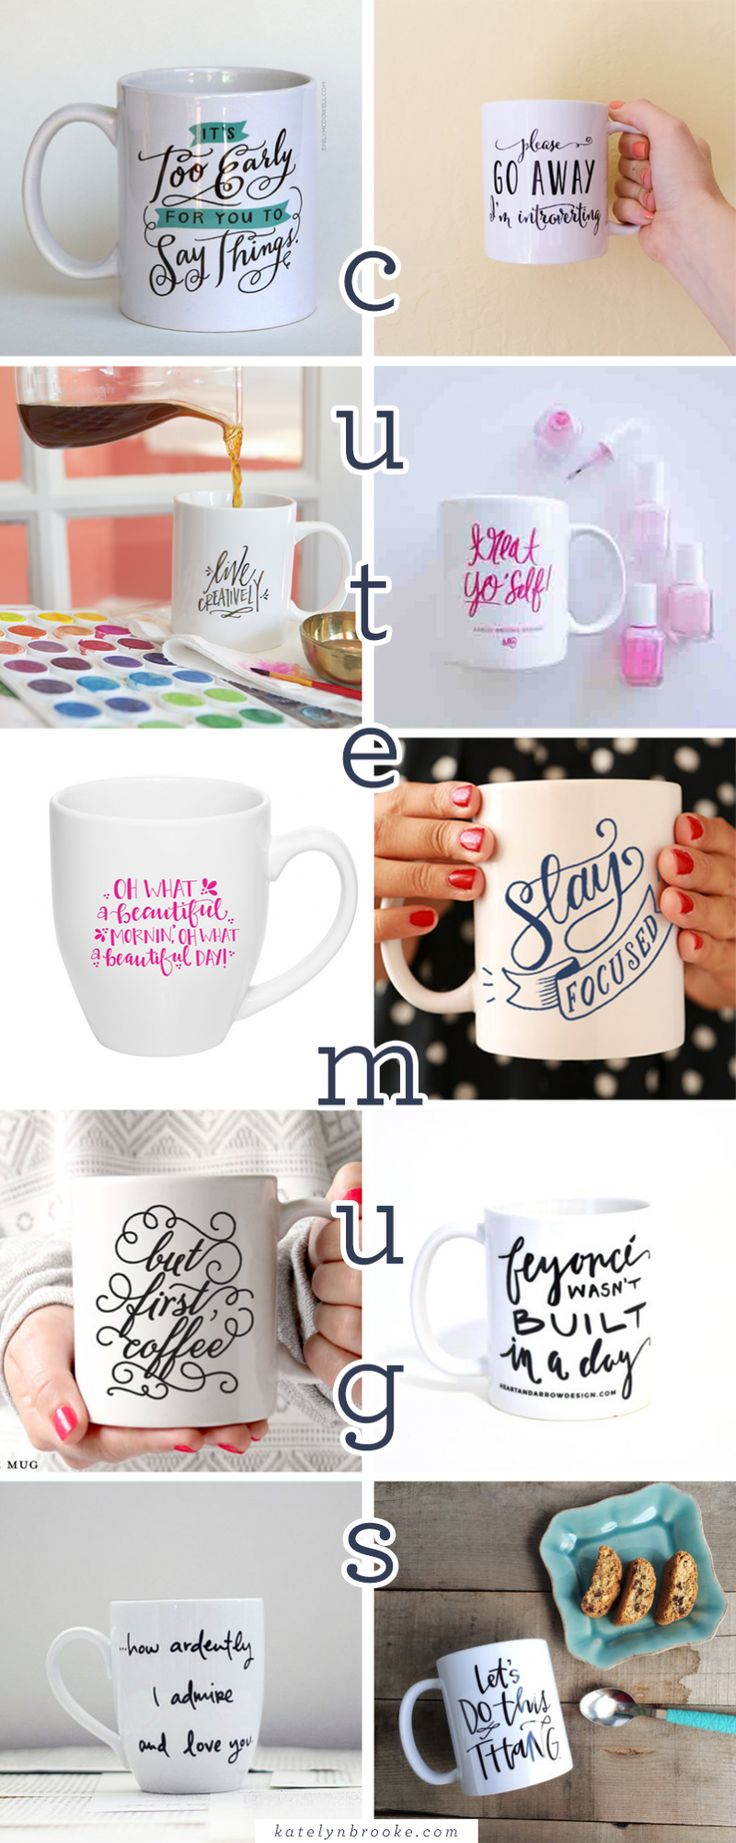 Add to Cart: Cute Mugs